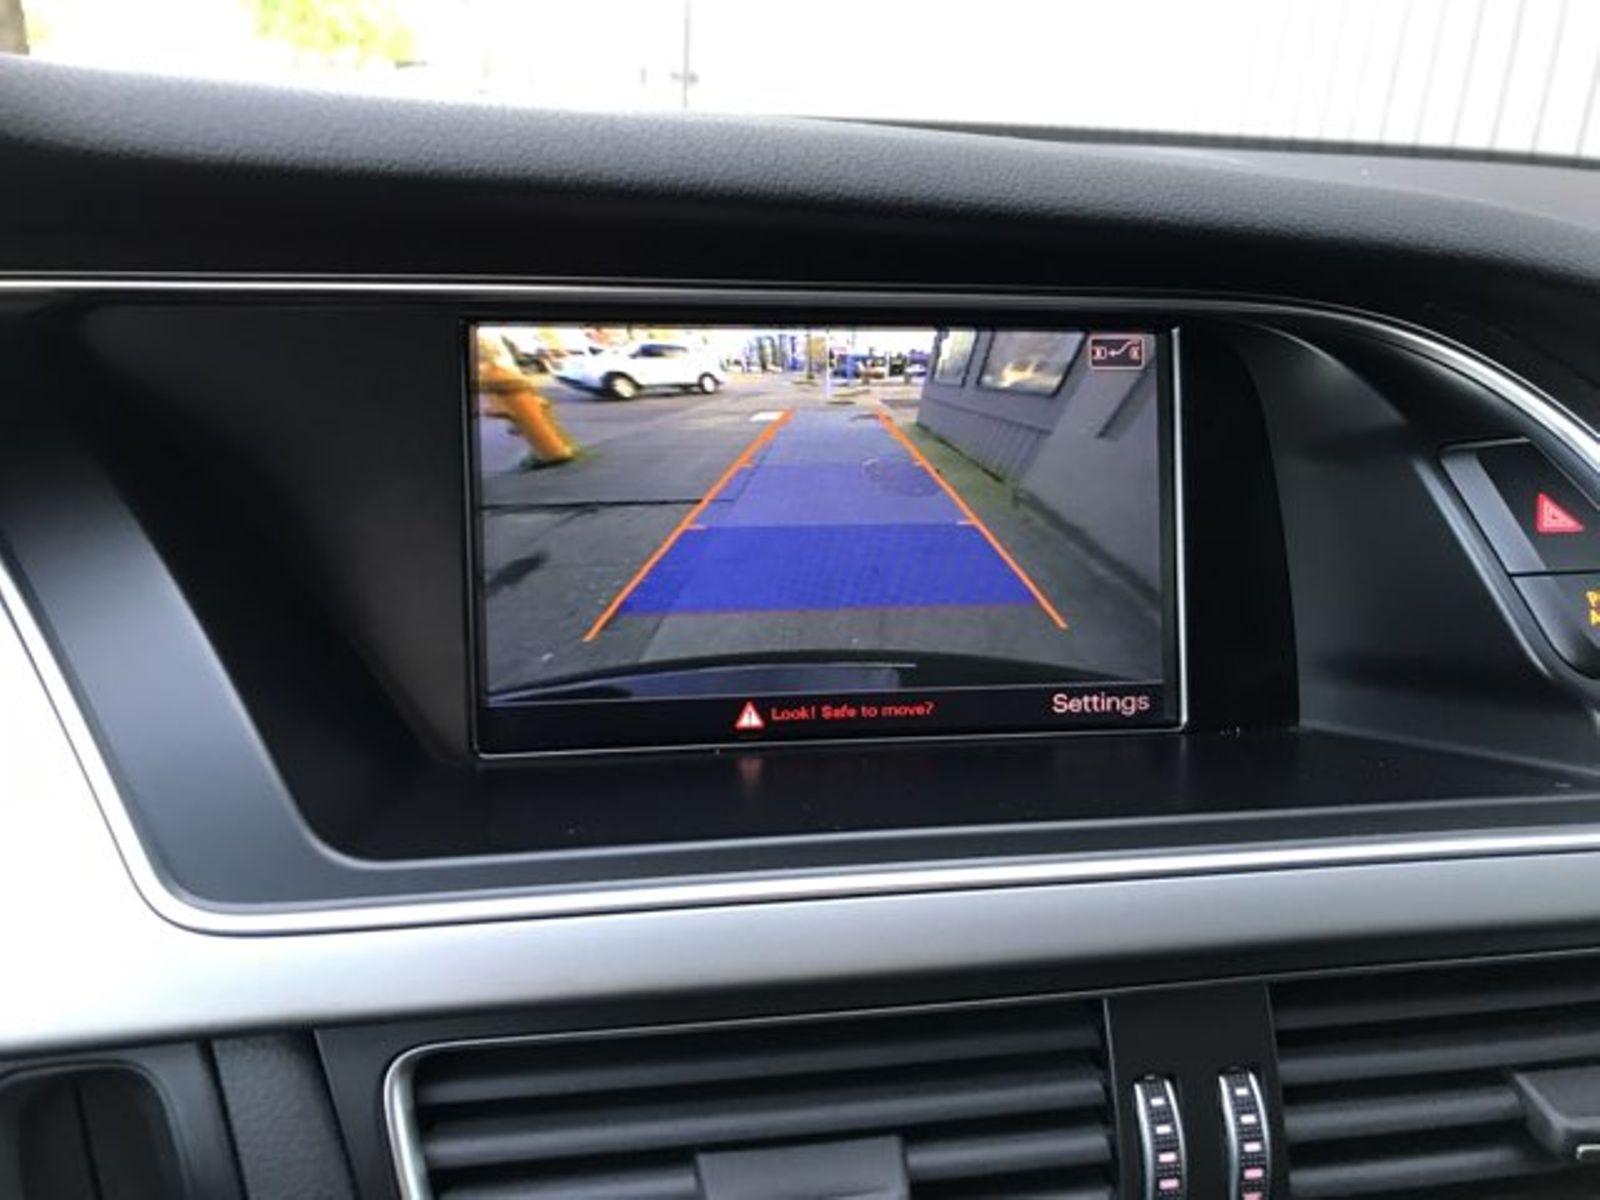 2015 audi allroad wagon quattro premium plus navi rear camera great rh caseattle com Shark Shark Files Manual Manual Manual File Flow Chart